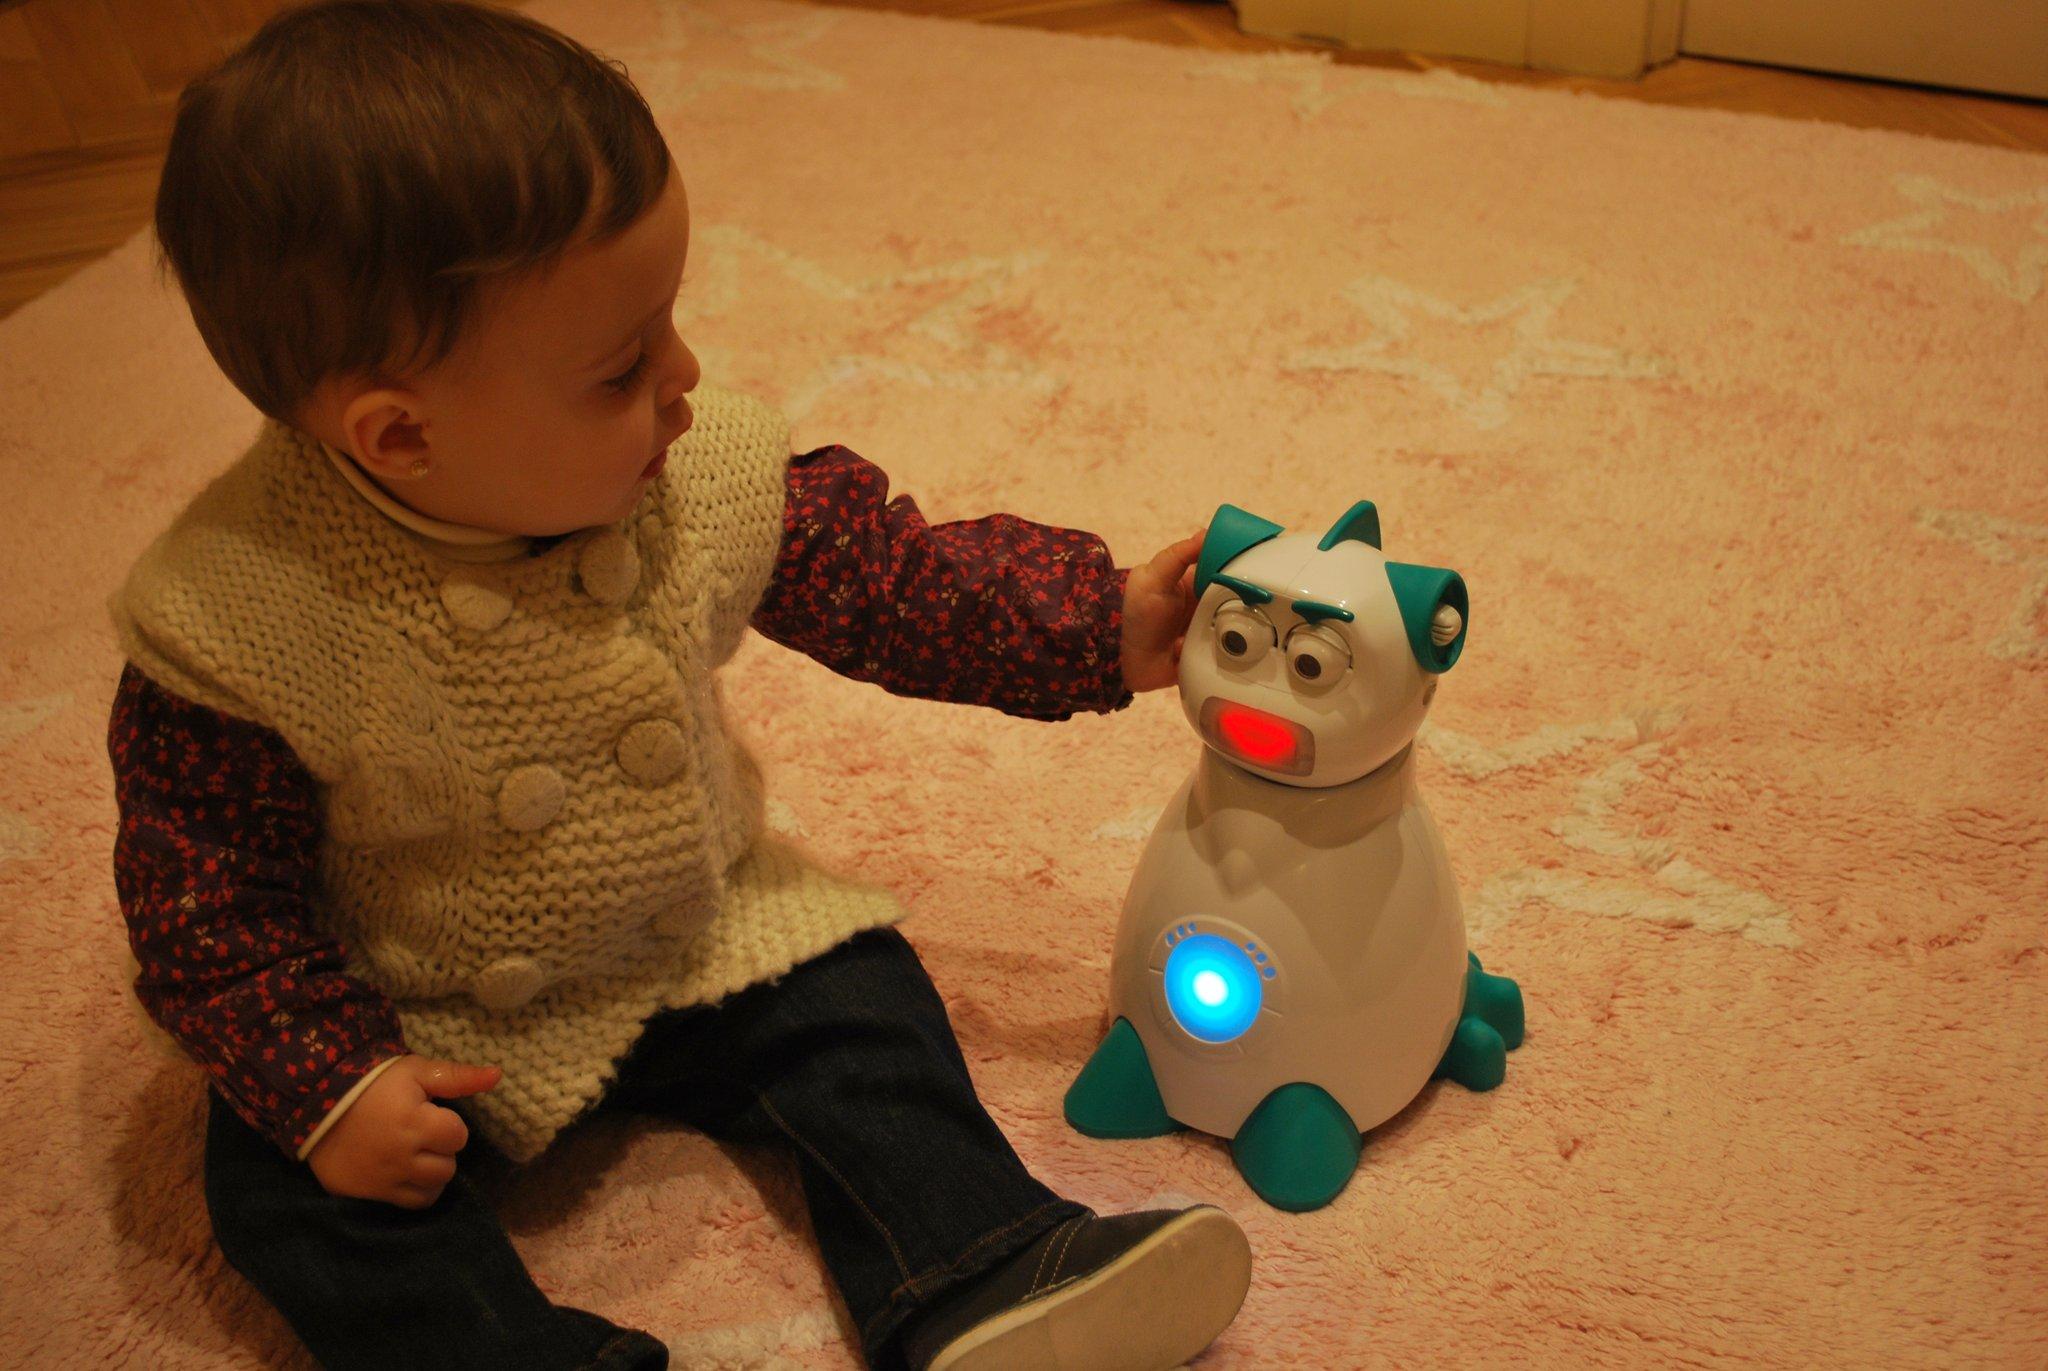 robot compagnon communicant aisoy1 v5 arobose. Black Bedroom Furniture Sets. Home Design Ideas